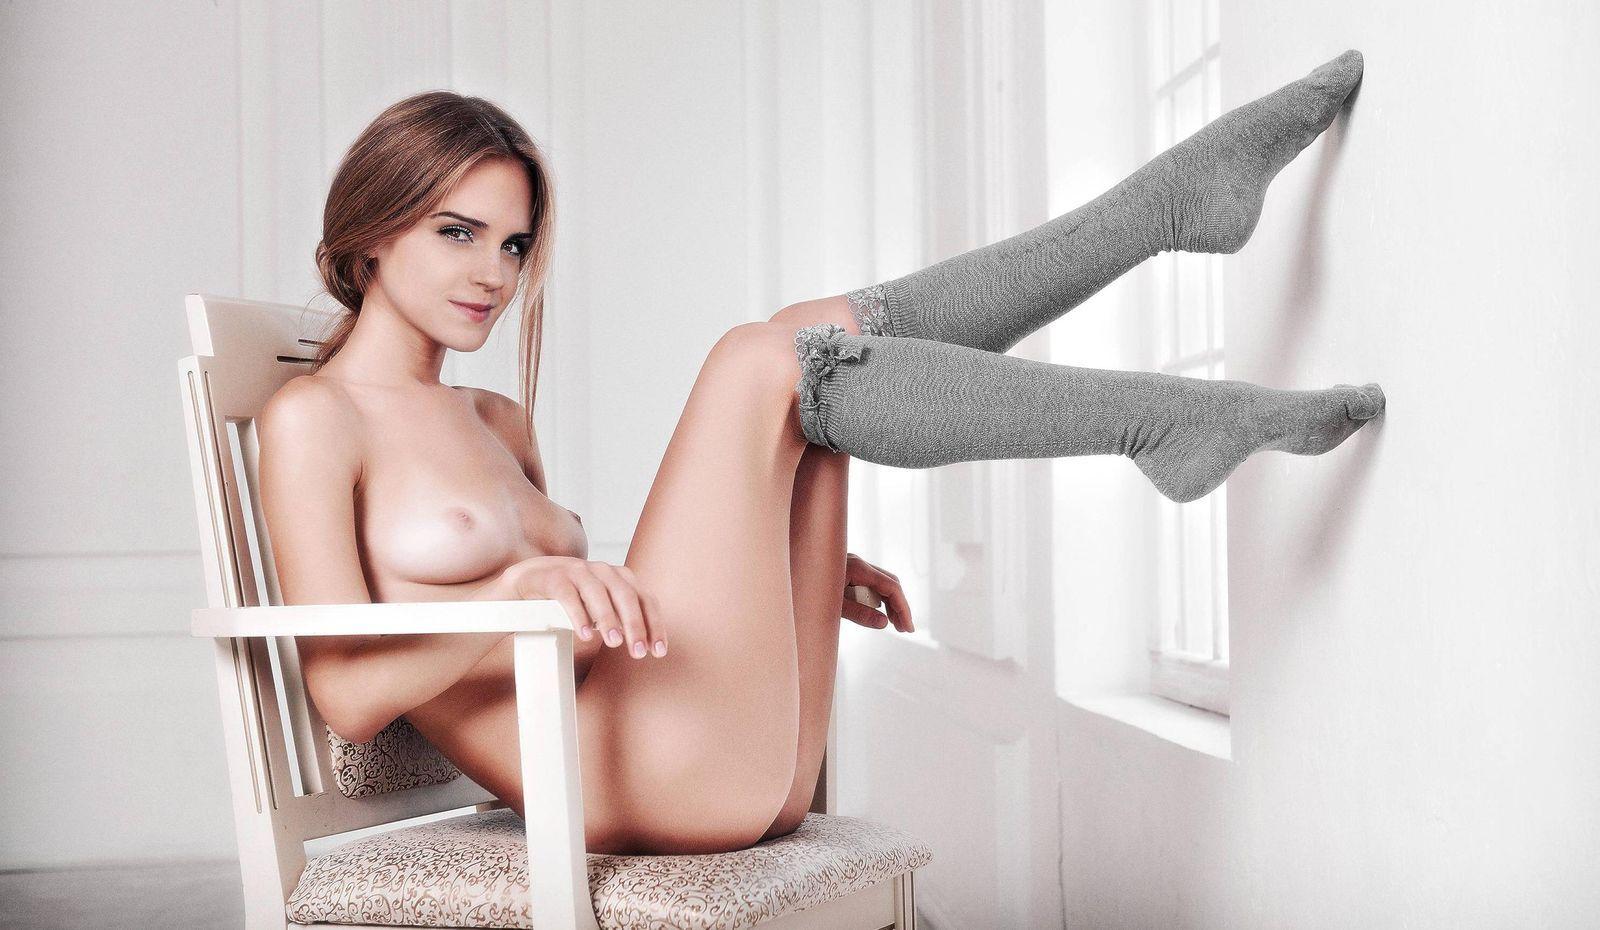 Hermione granger fake naked #9